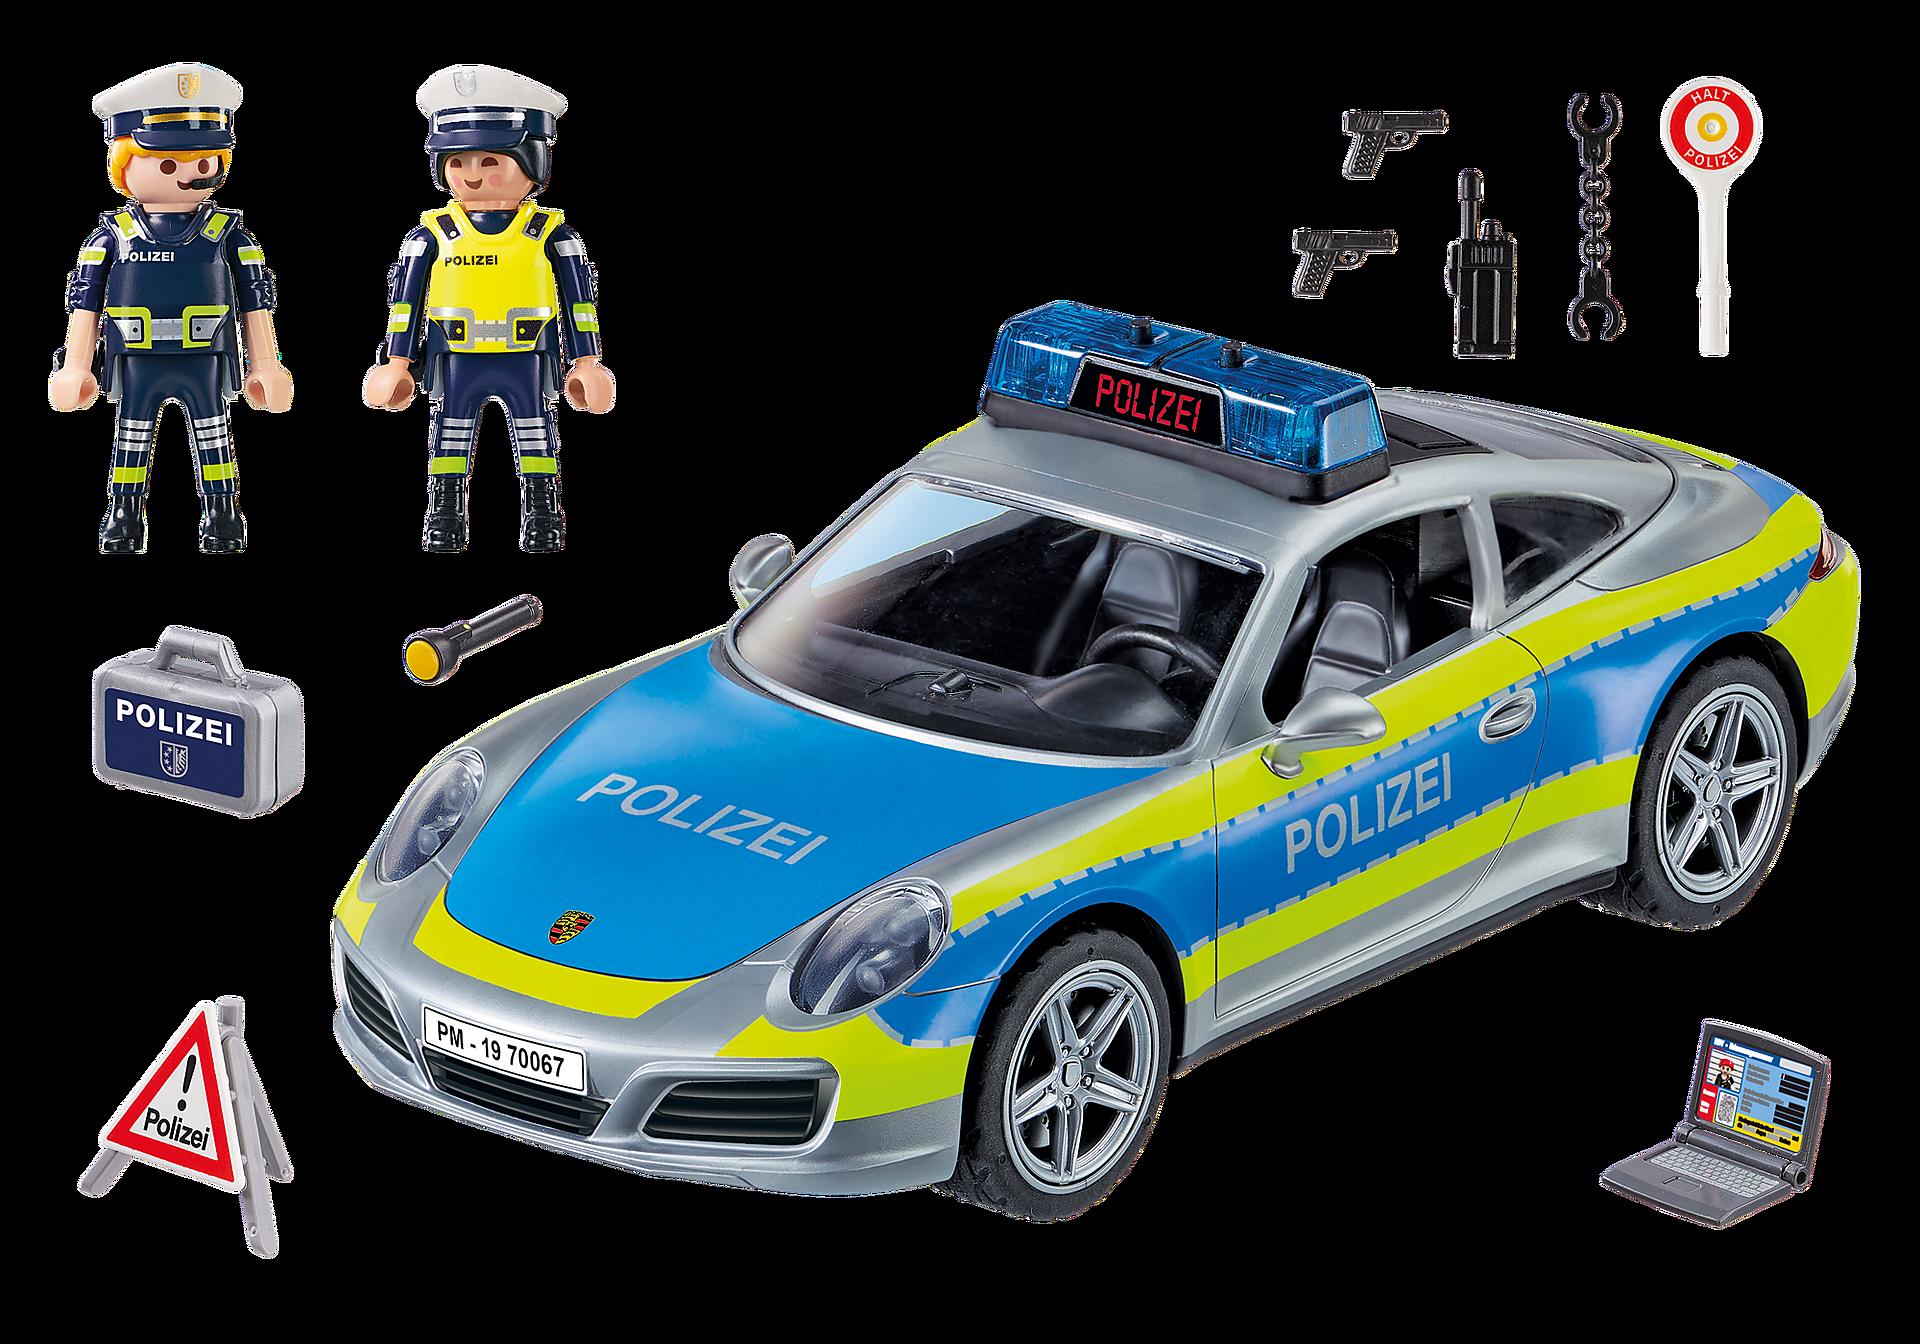 70067 Porsche 911 Carrera 4S Polizei zoom image3